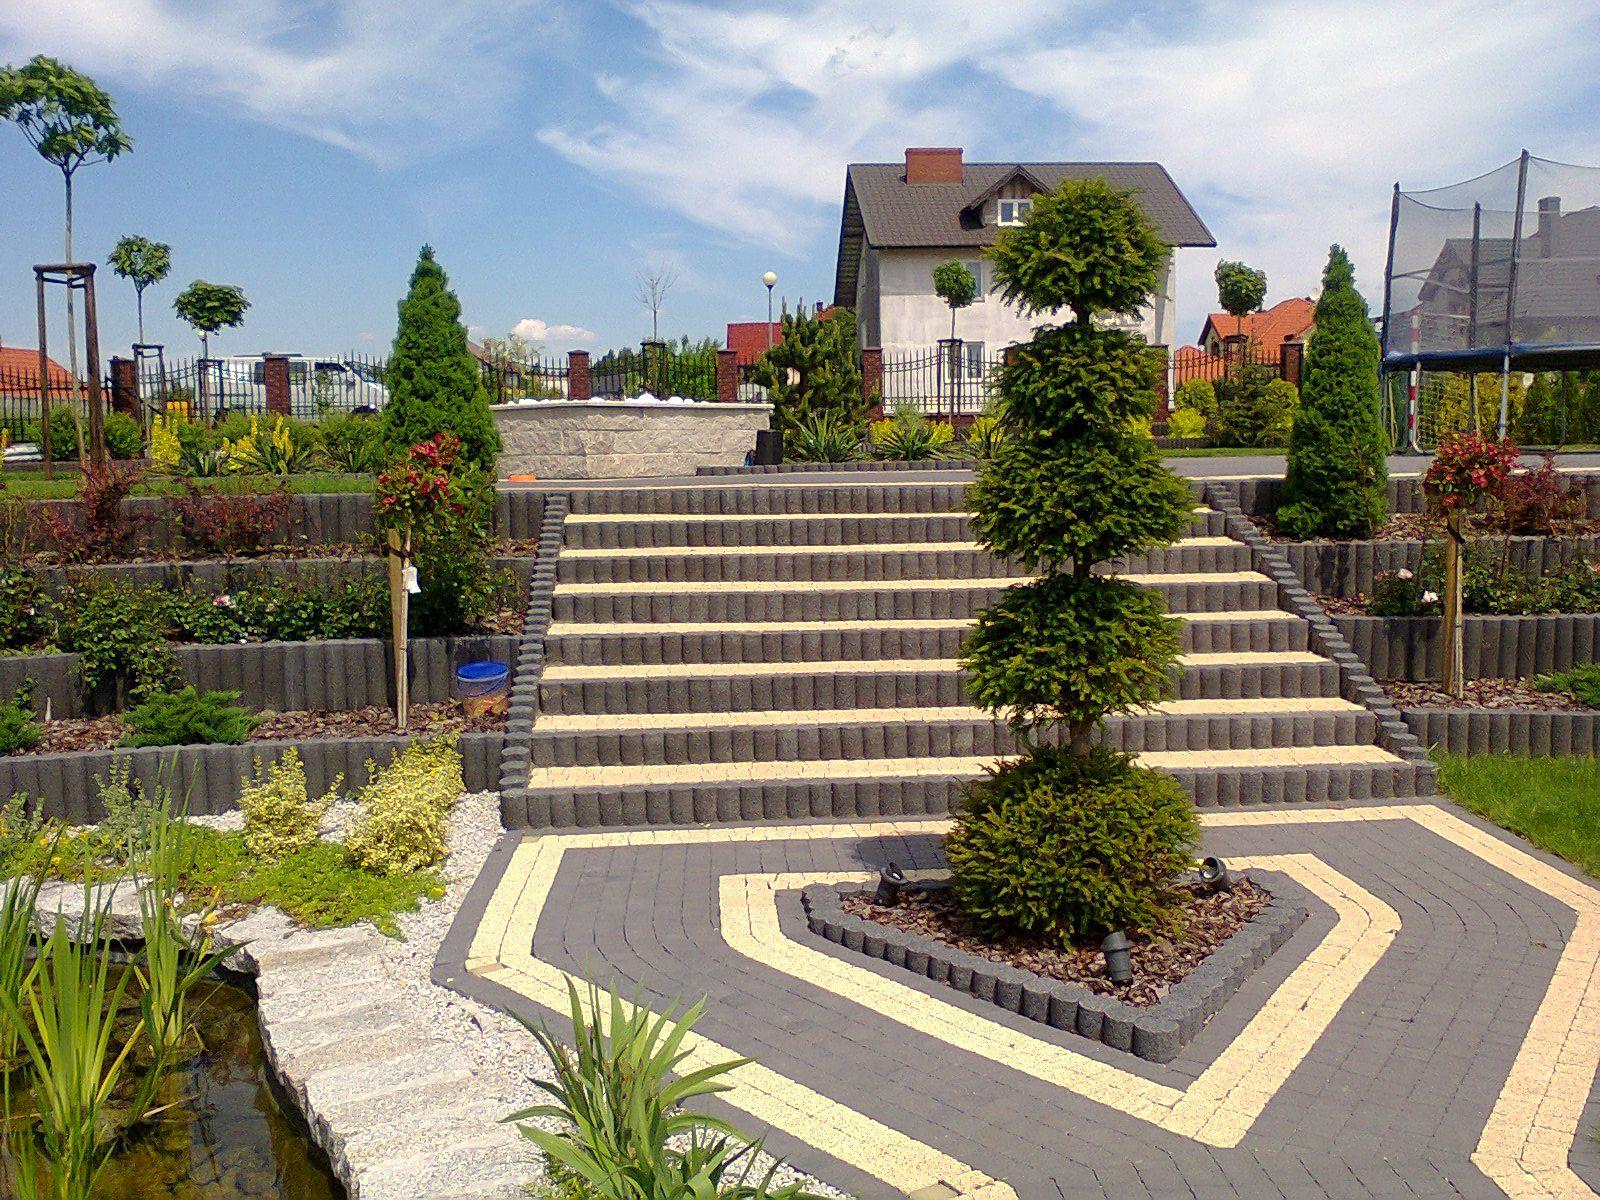 70 best garden modern images on pinterest garden modern auras garden design projekt ogrodu i realizacja kielce ogrOd nowoczesny z oczkiem